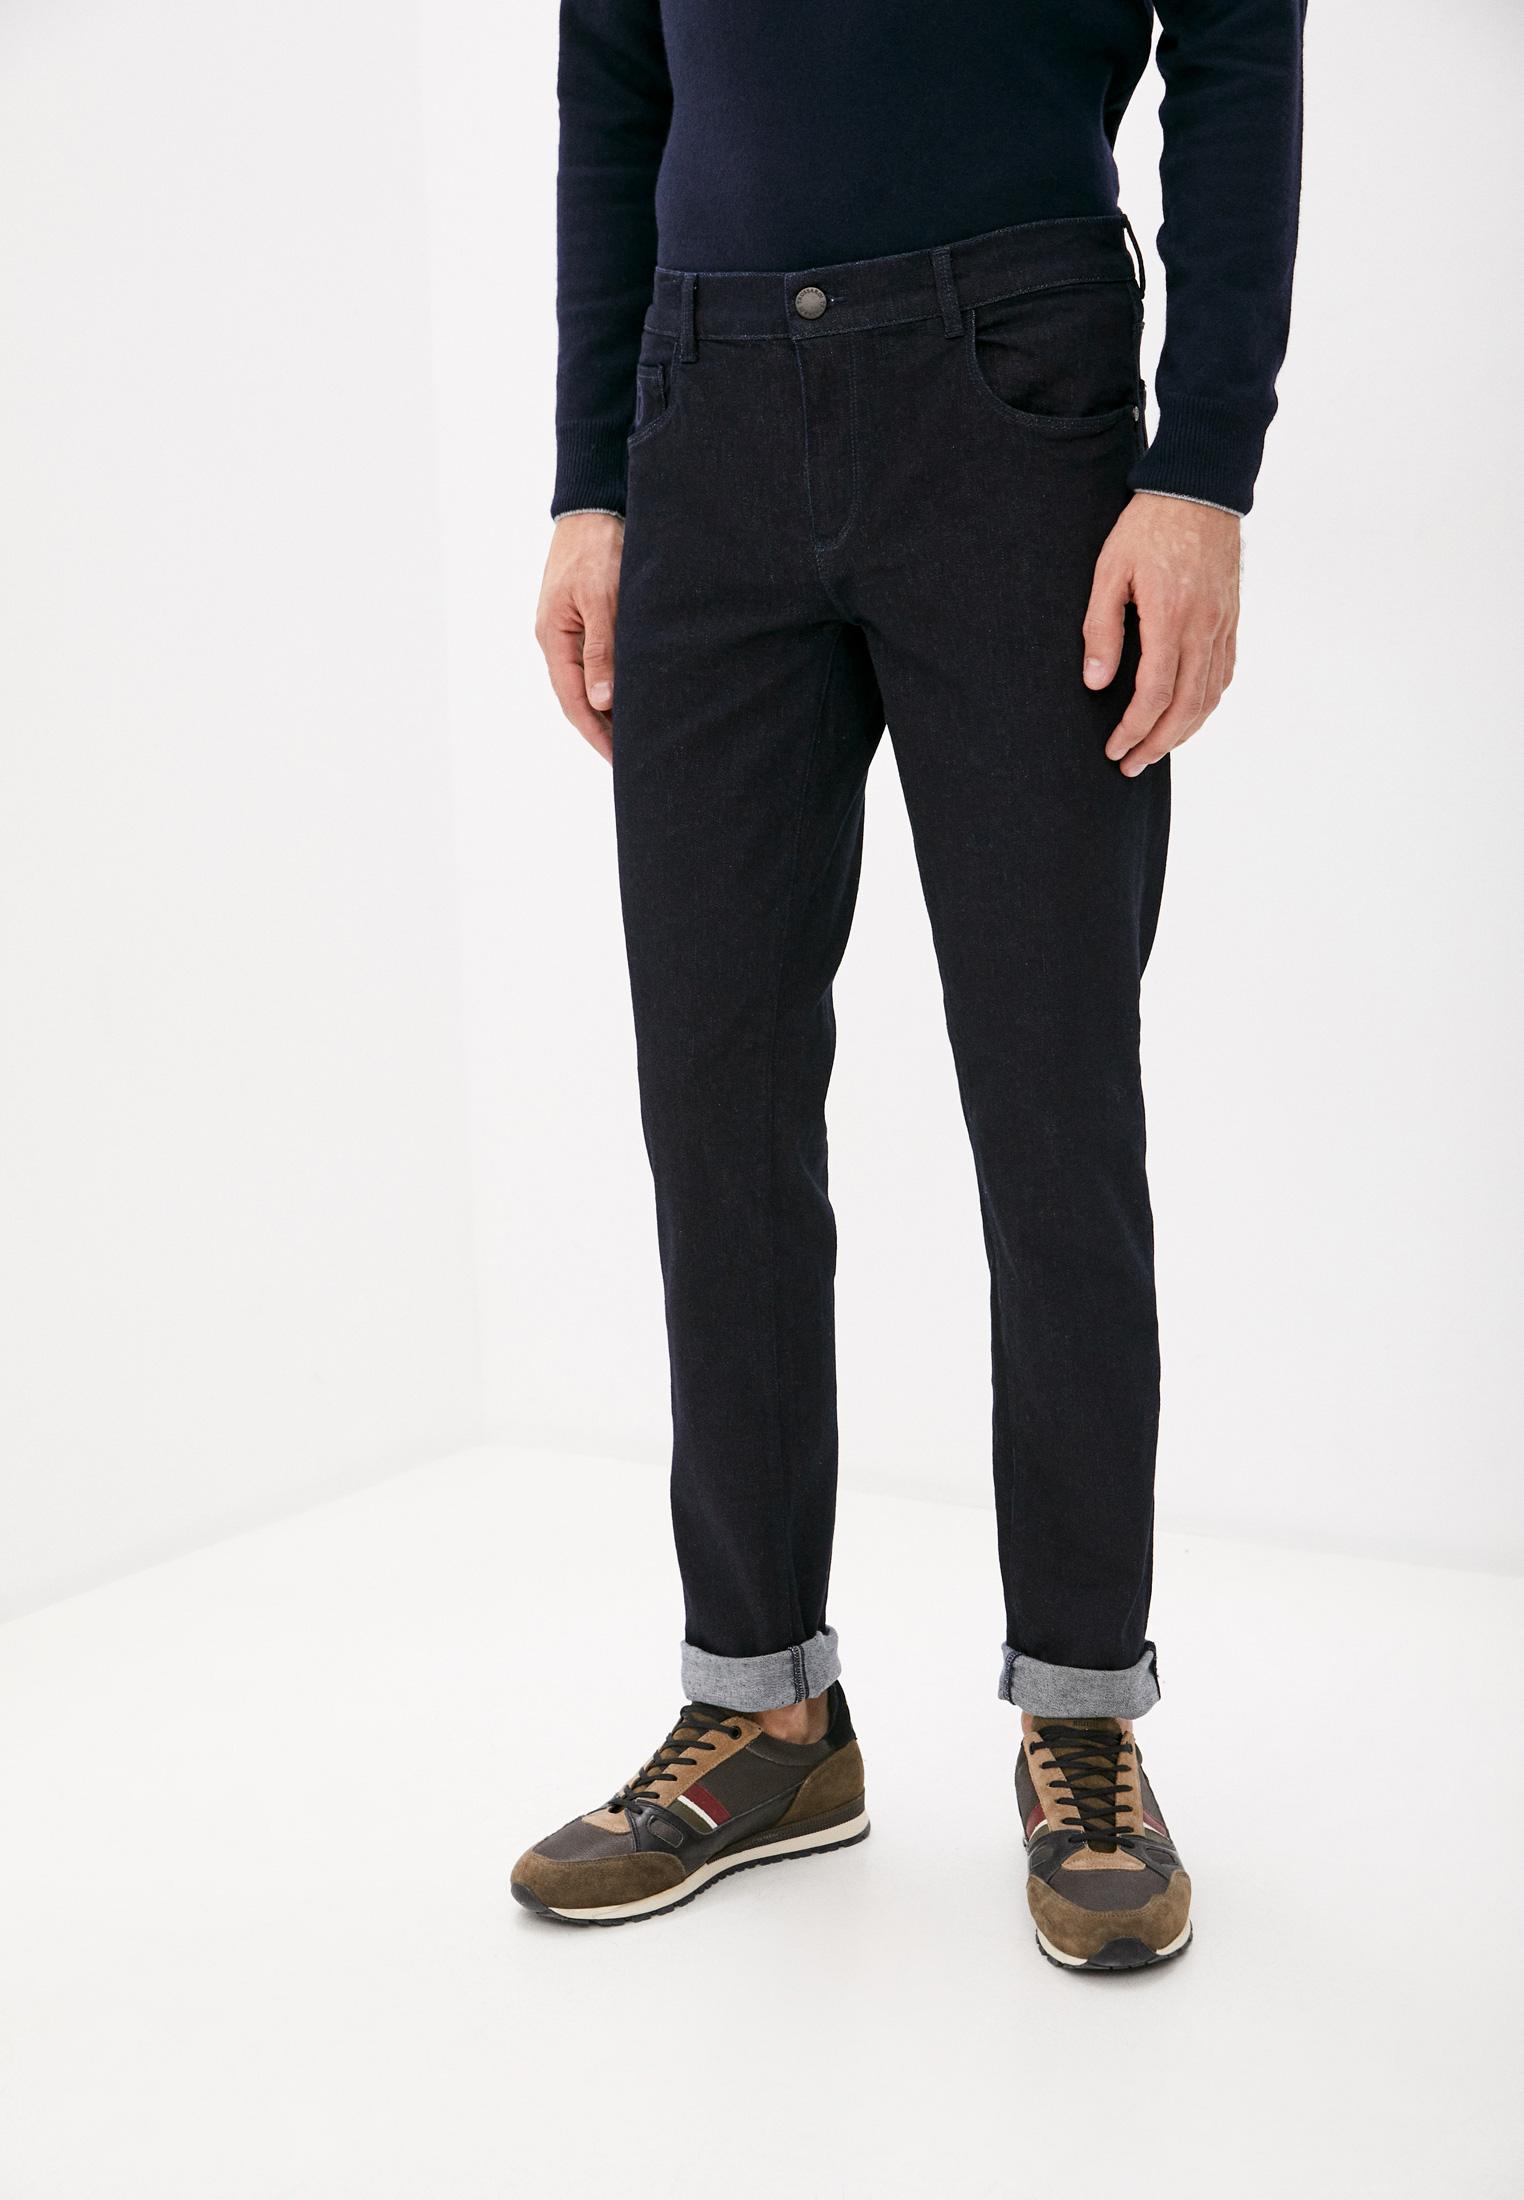 Джинсы Trussardi Jeans за 8 586 ₽. в интернет-магазине Lamoda.ru